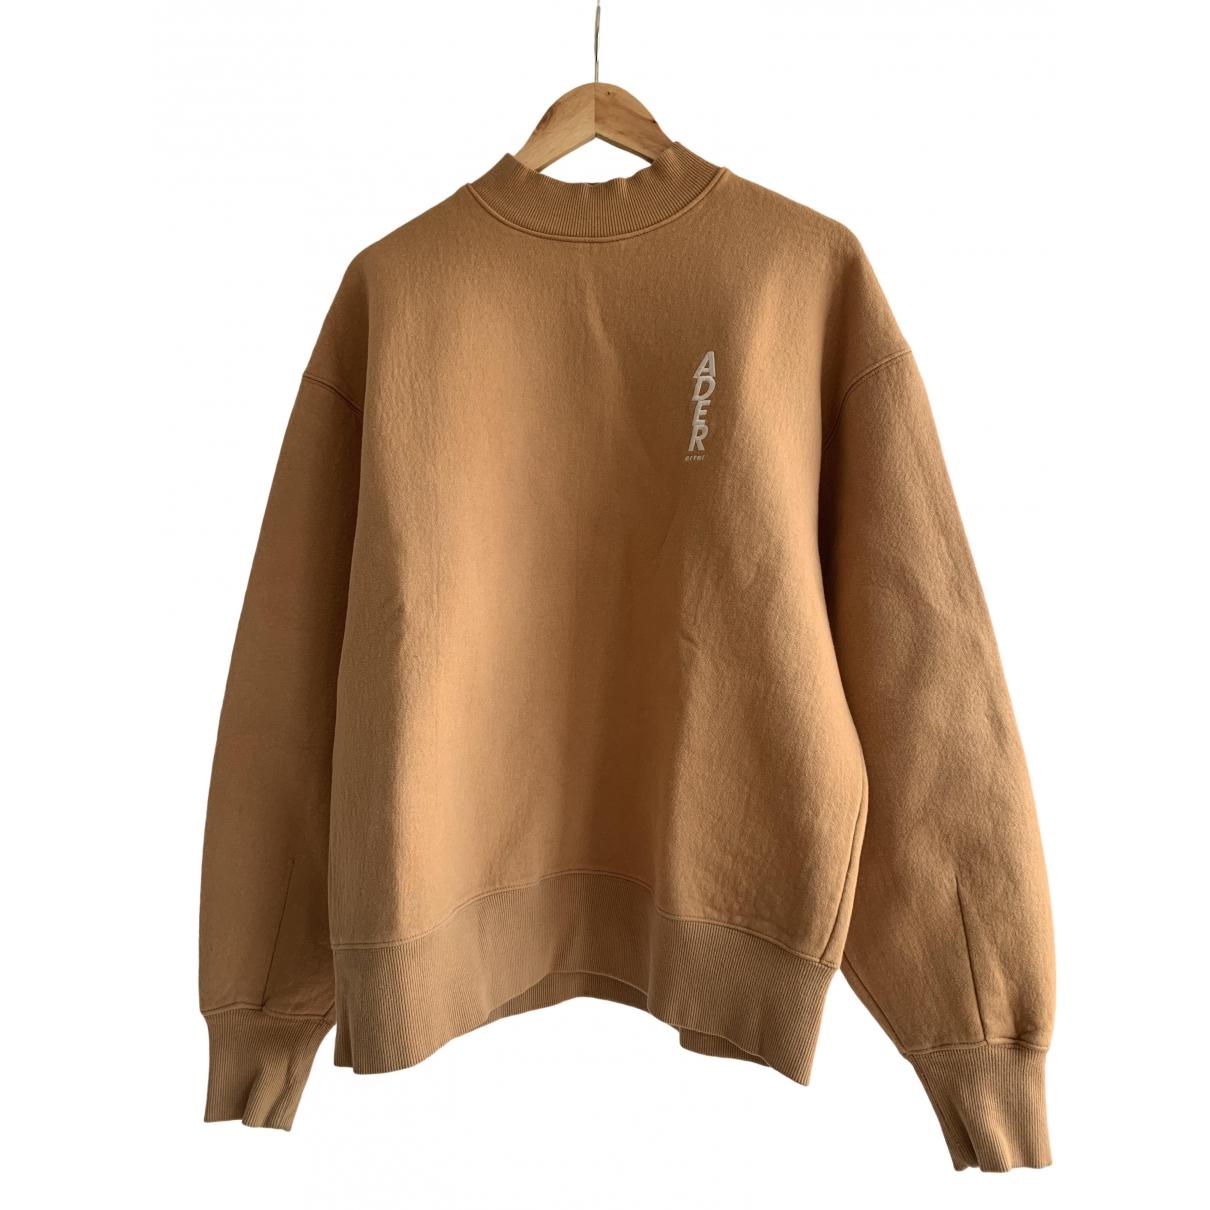 Ader Error Camel Cotton Knitwear & Sweatshirt